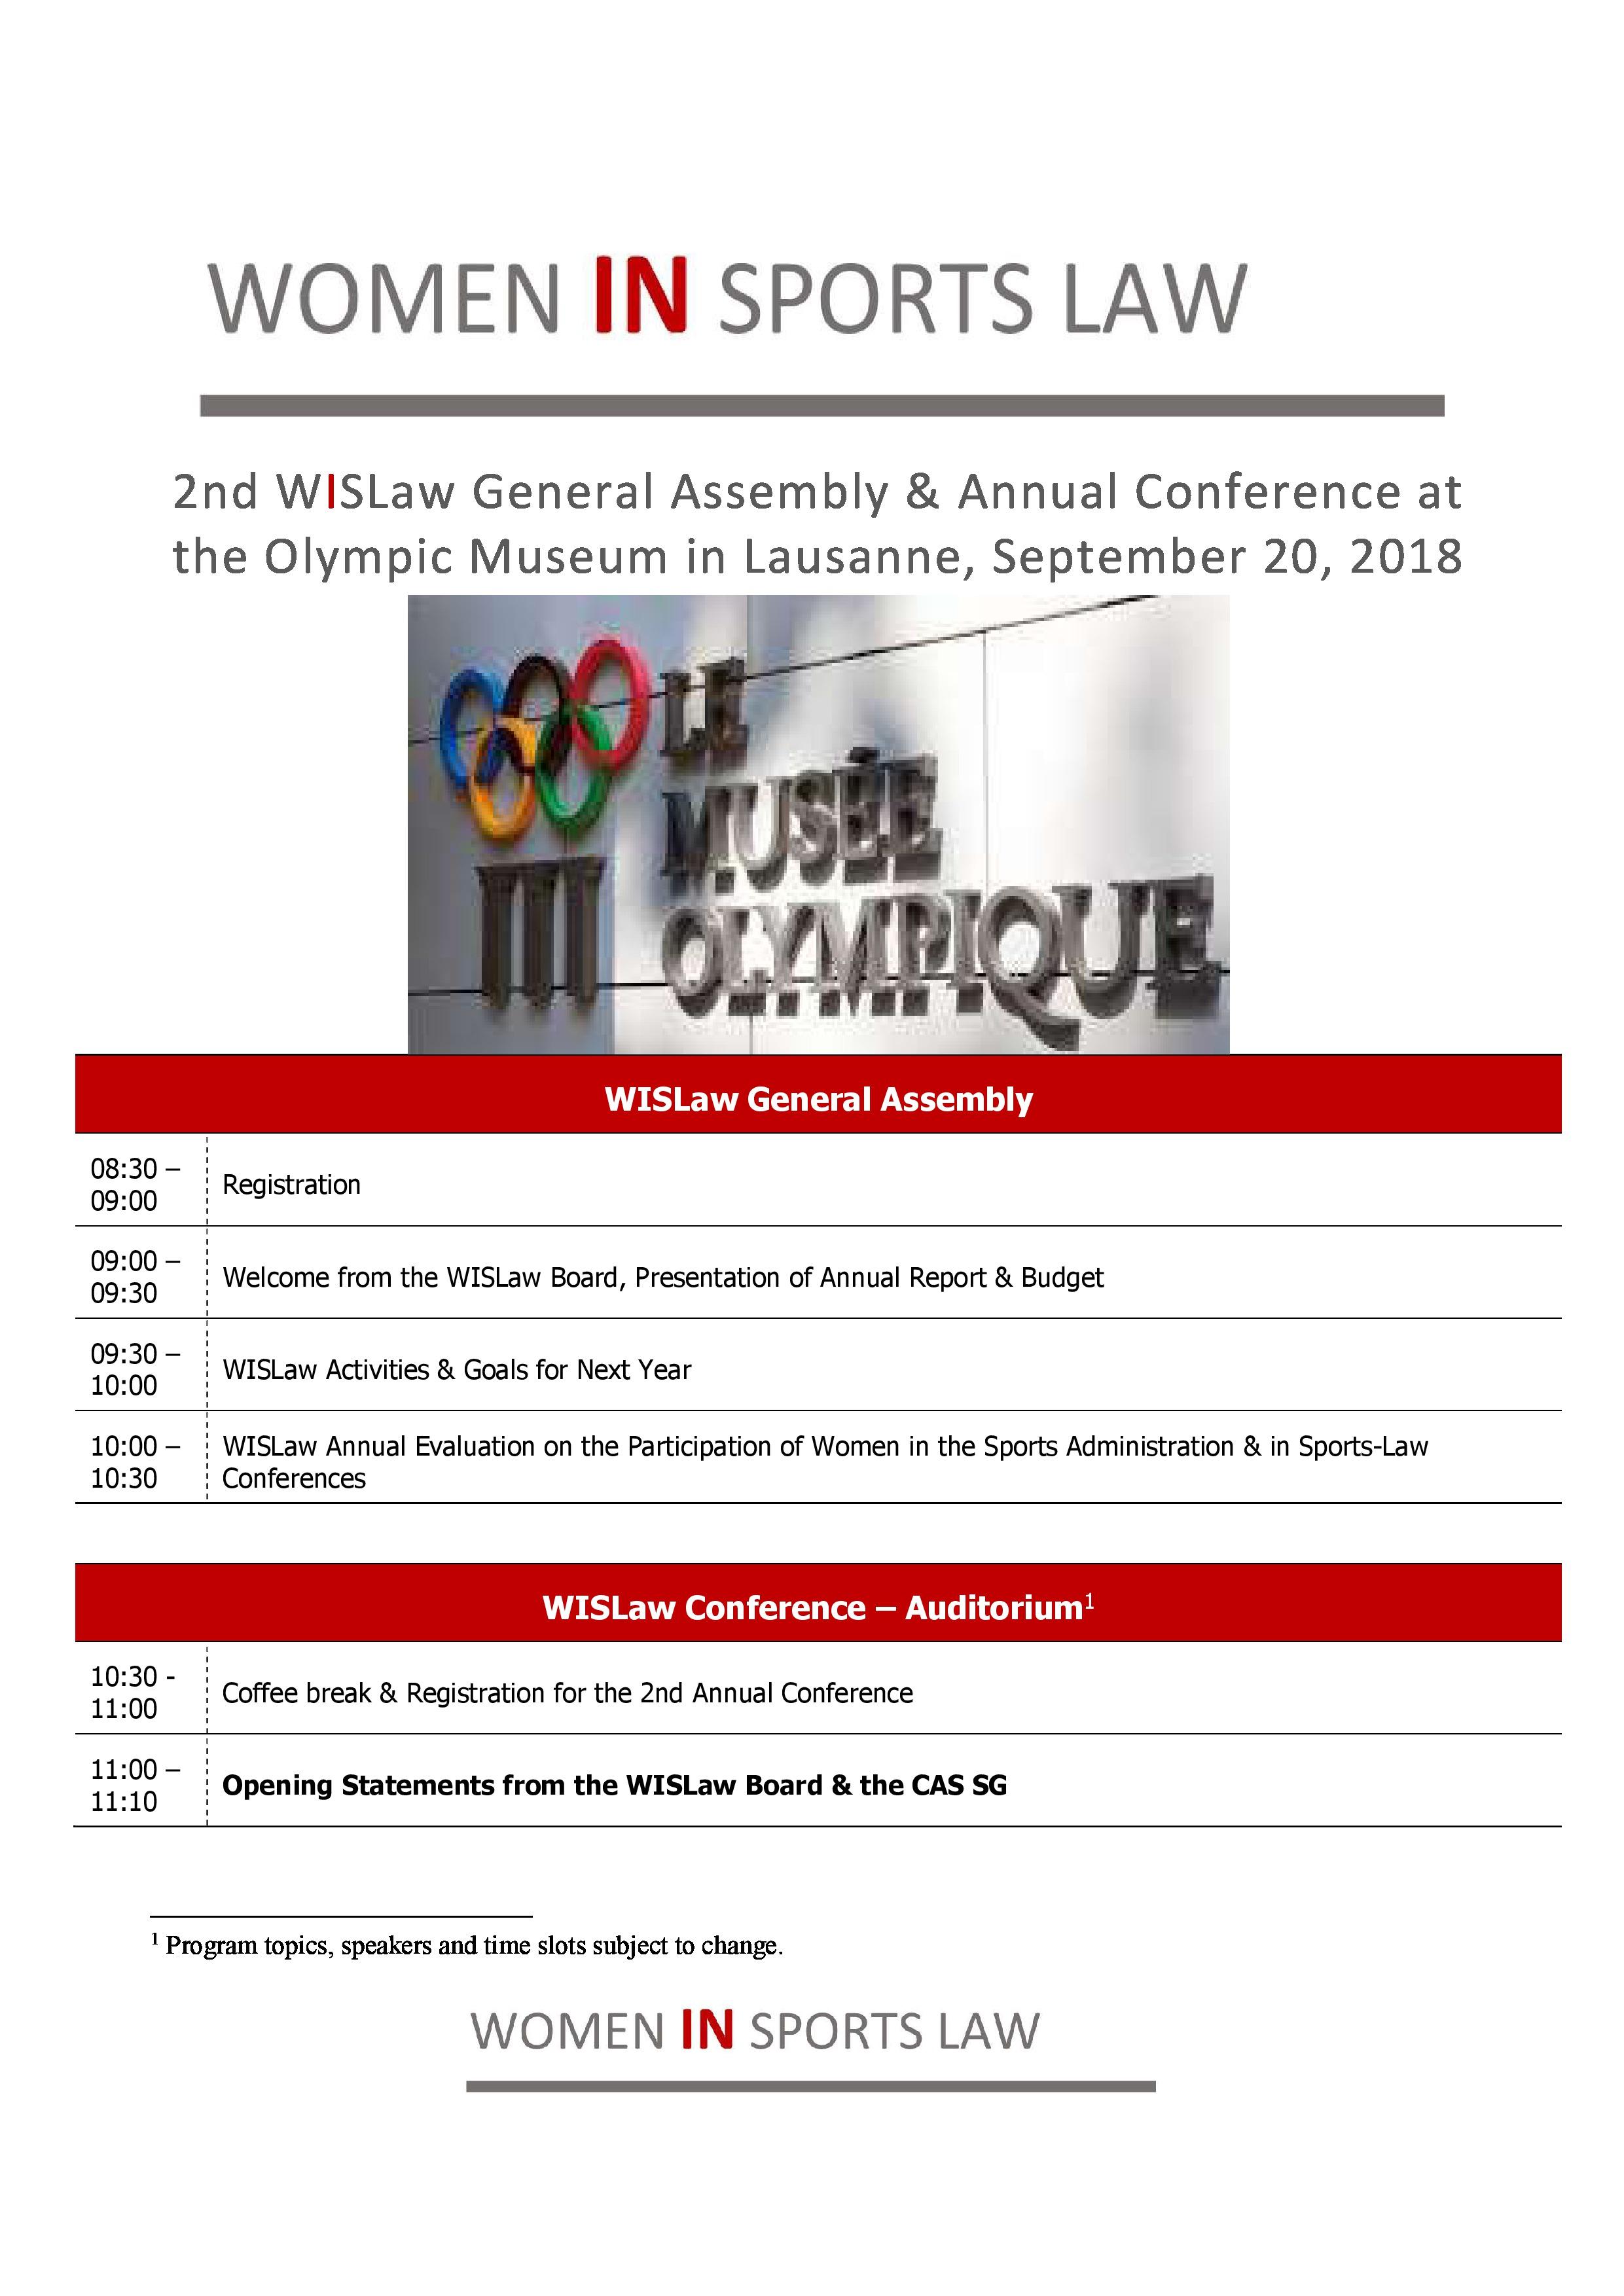 2ndwislawconferencepage1outof2.jpg